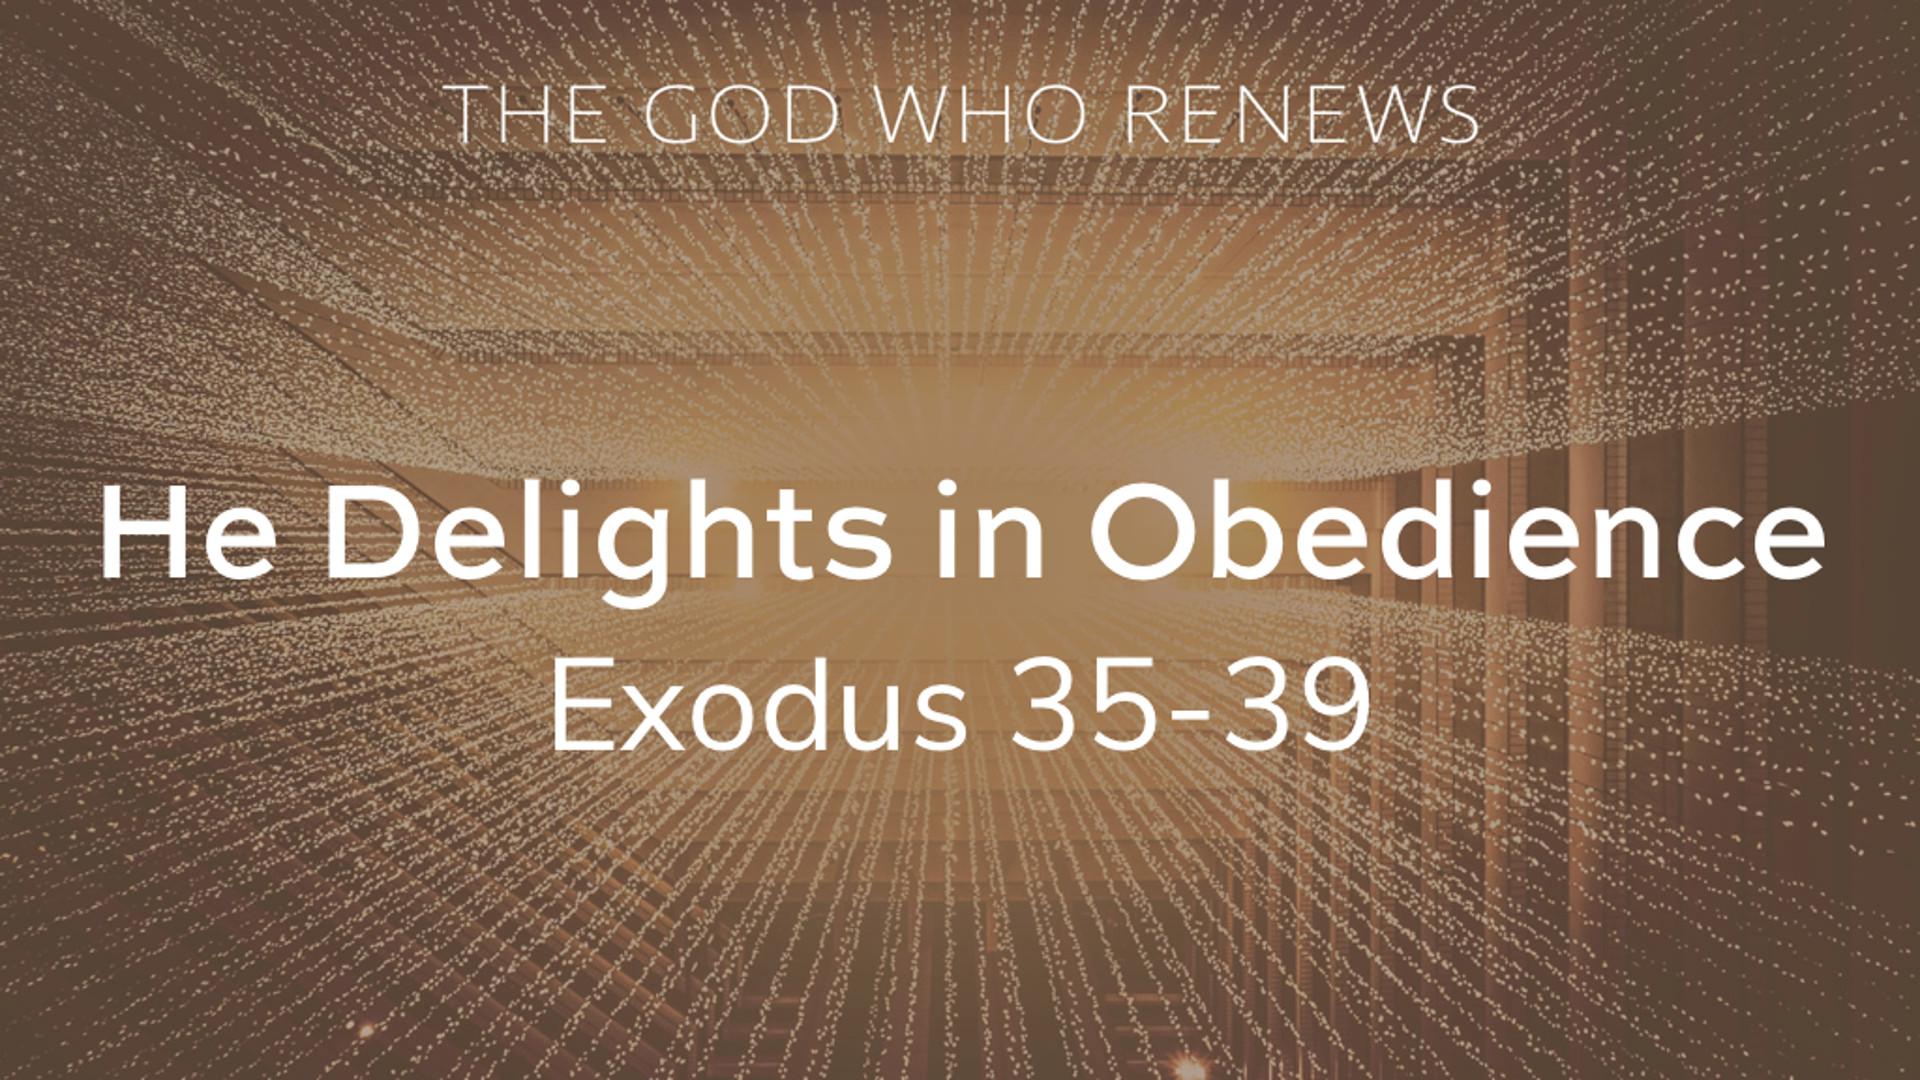 Exodus 35-39 - He Delights in Obedience.jpg